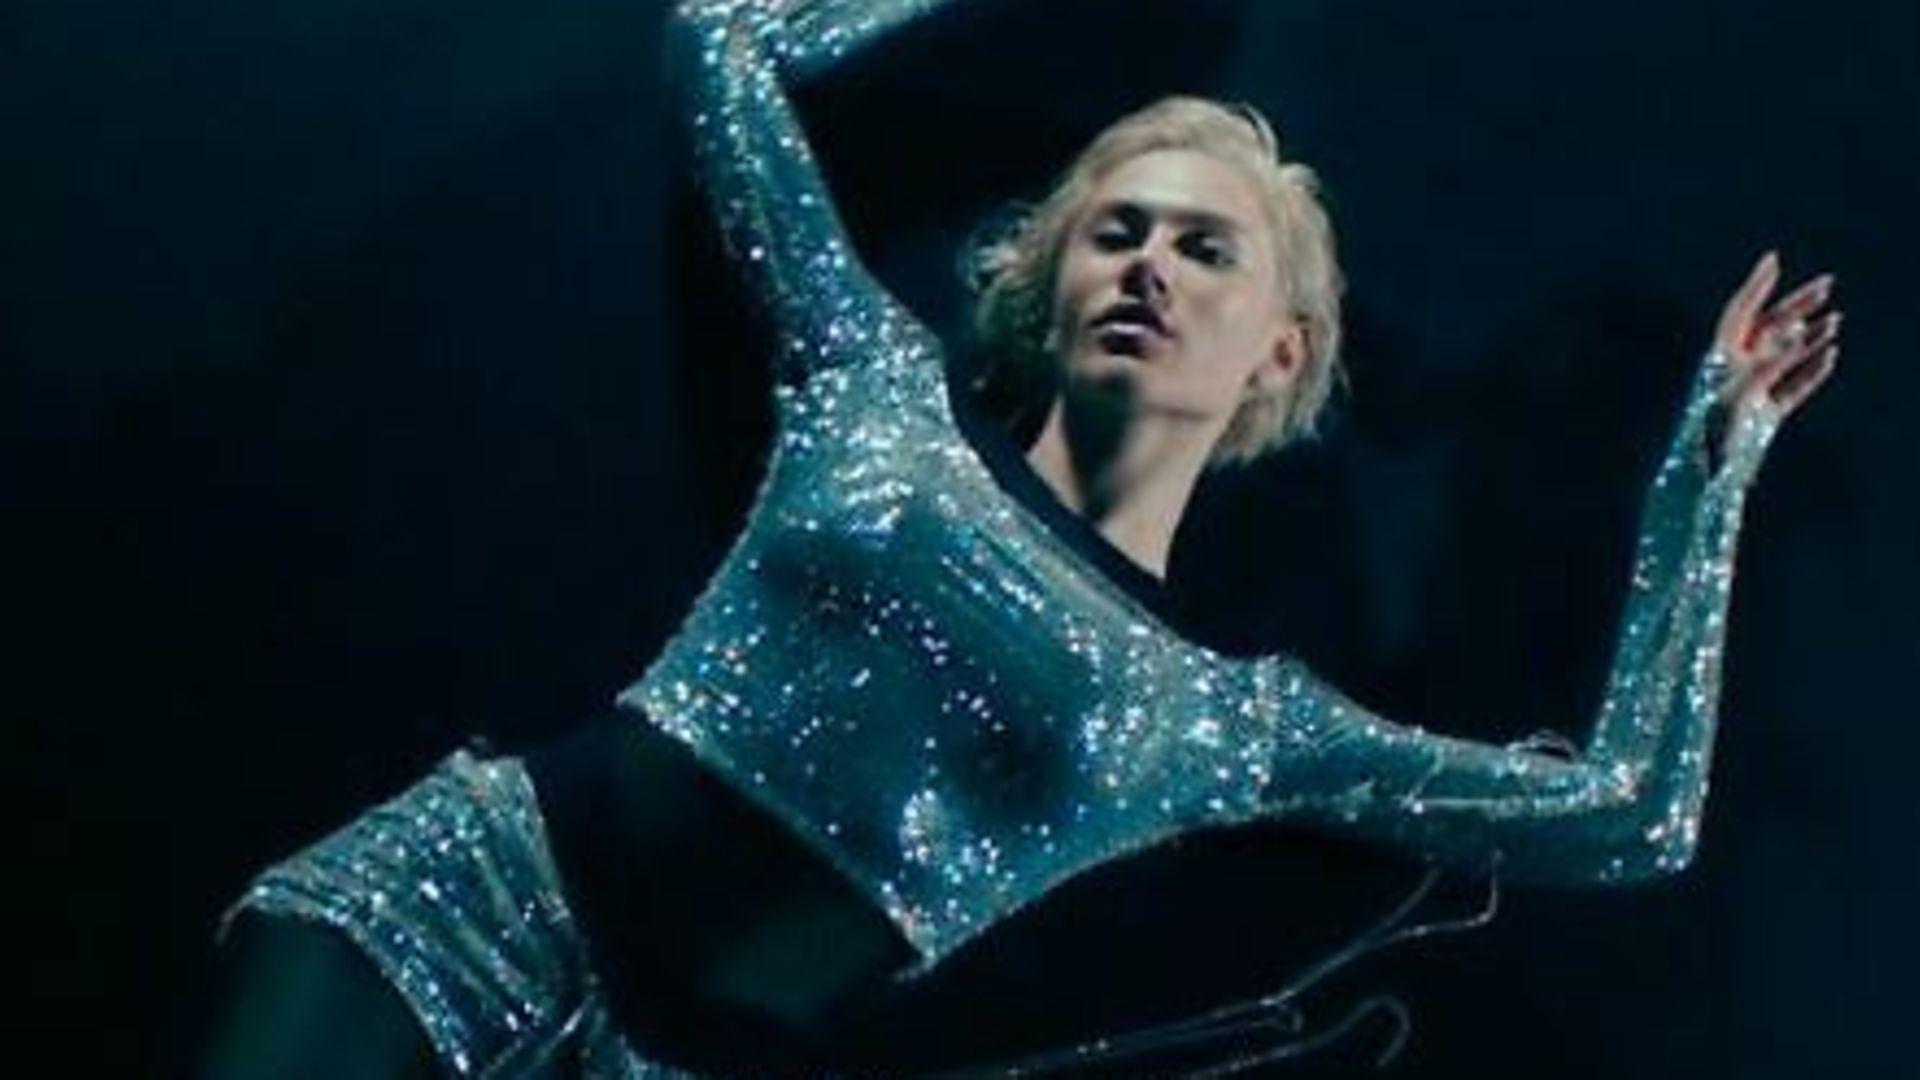 Greek singer Elena Tsagrinou in the video for El Diablo, Cyprus' controversial entry for Eurovision 2021 - Credit: Panik Records